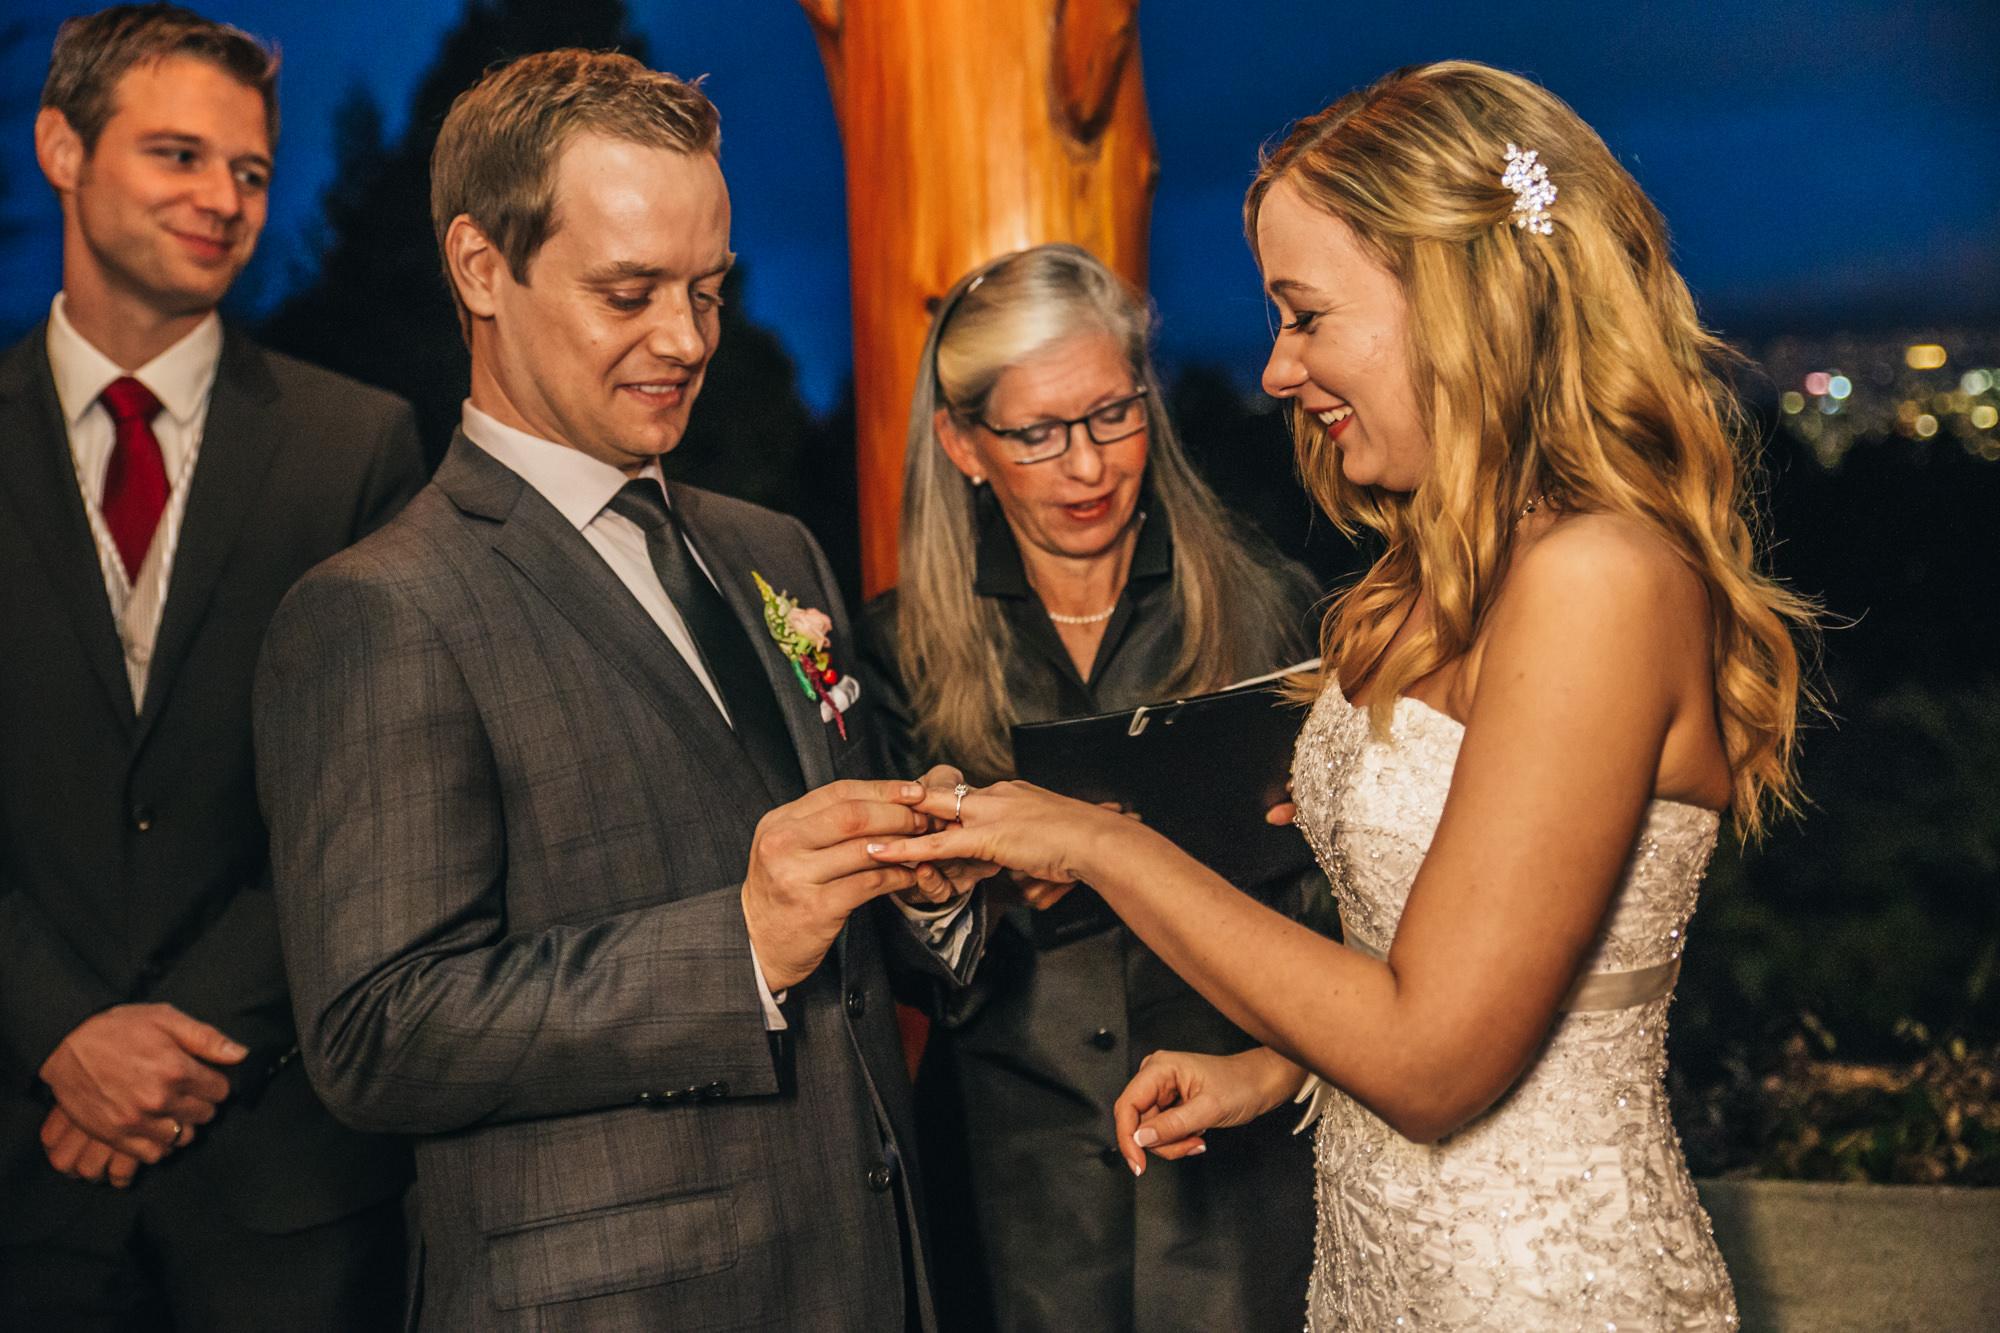 32-seasons-in-the-park-wedding-ceremony.jpg